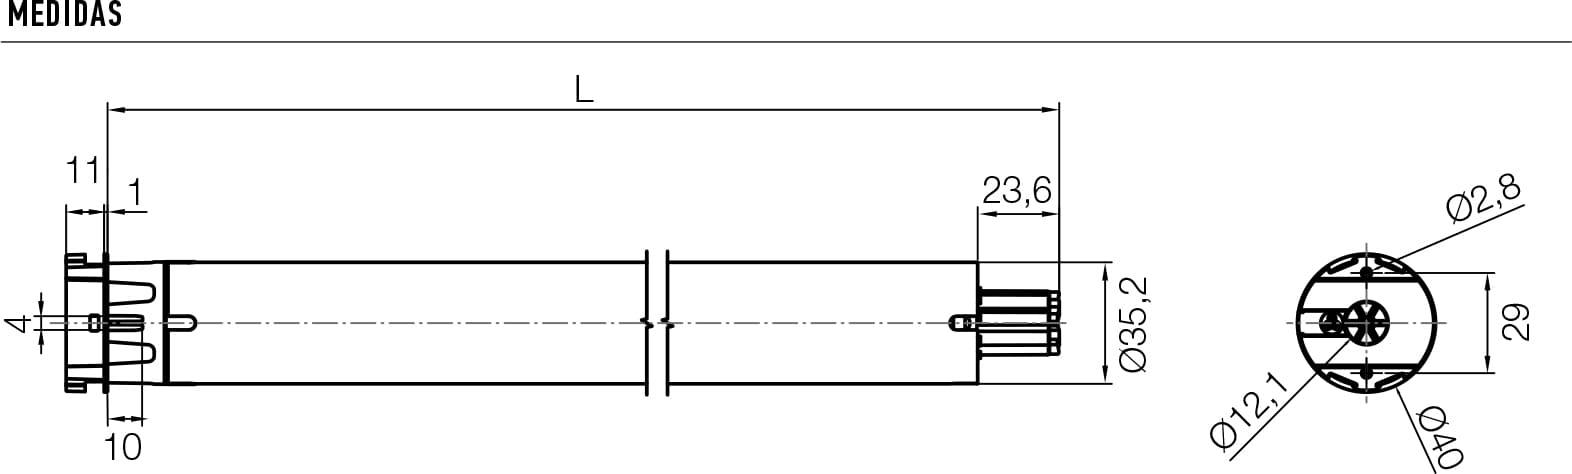 caracteristicas-era-star-sa-2